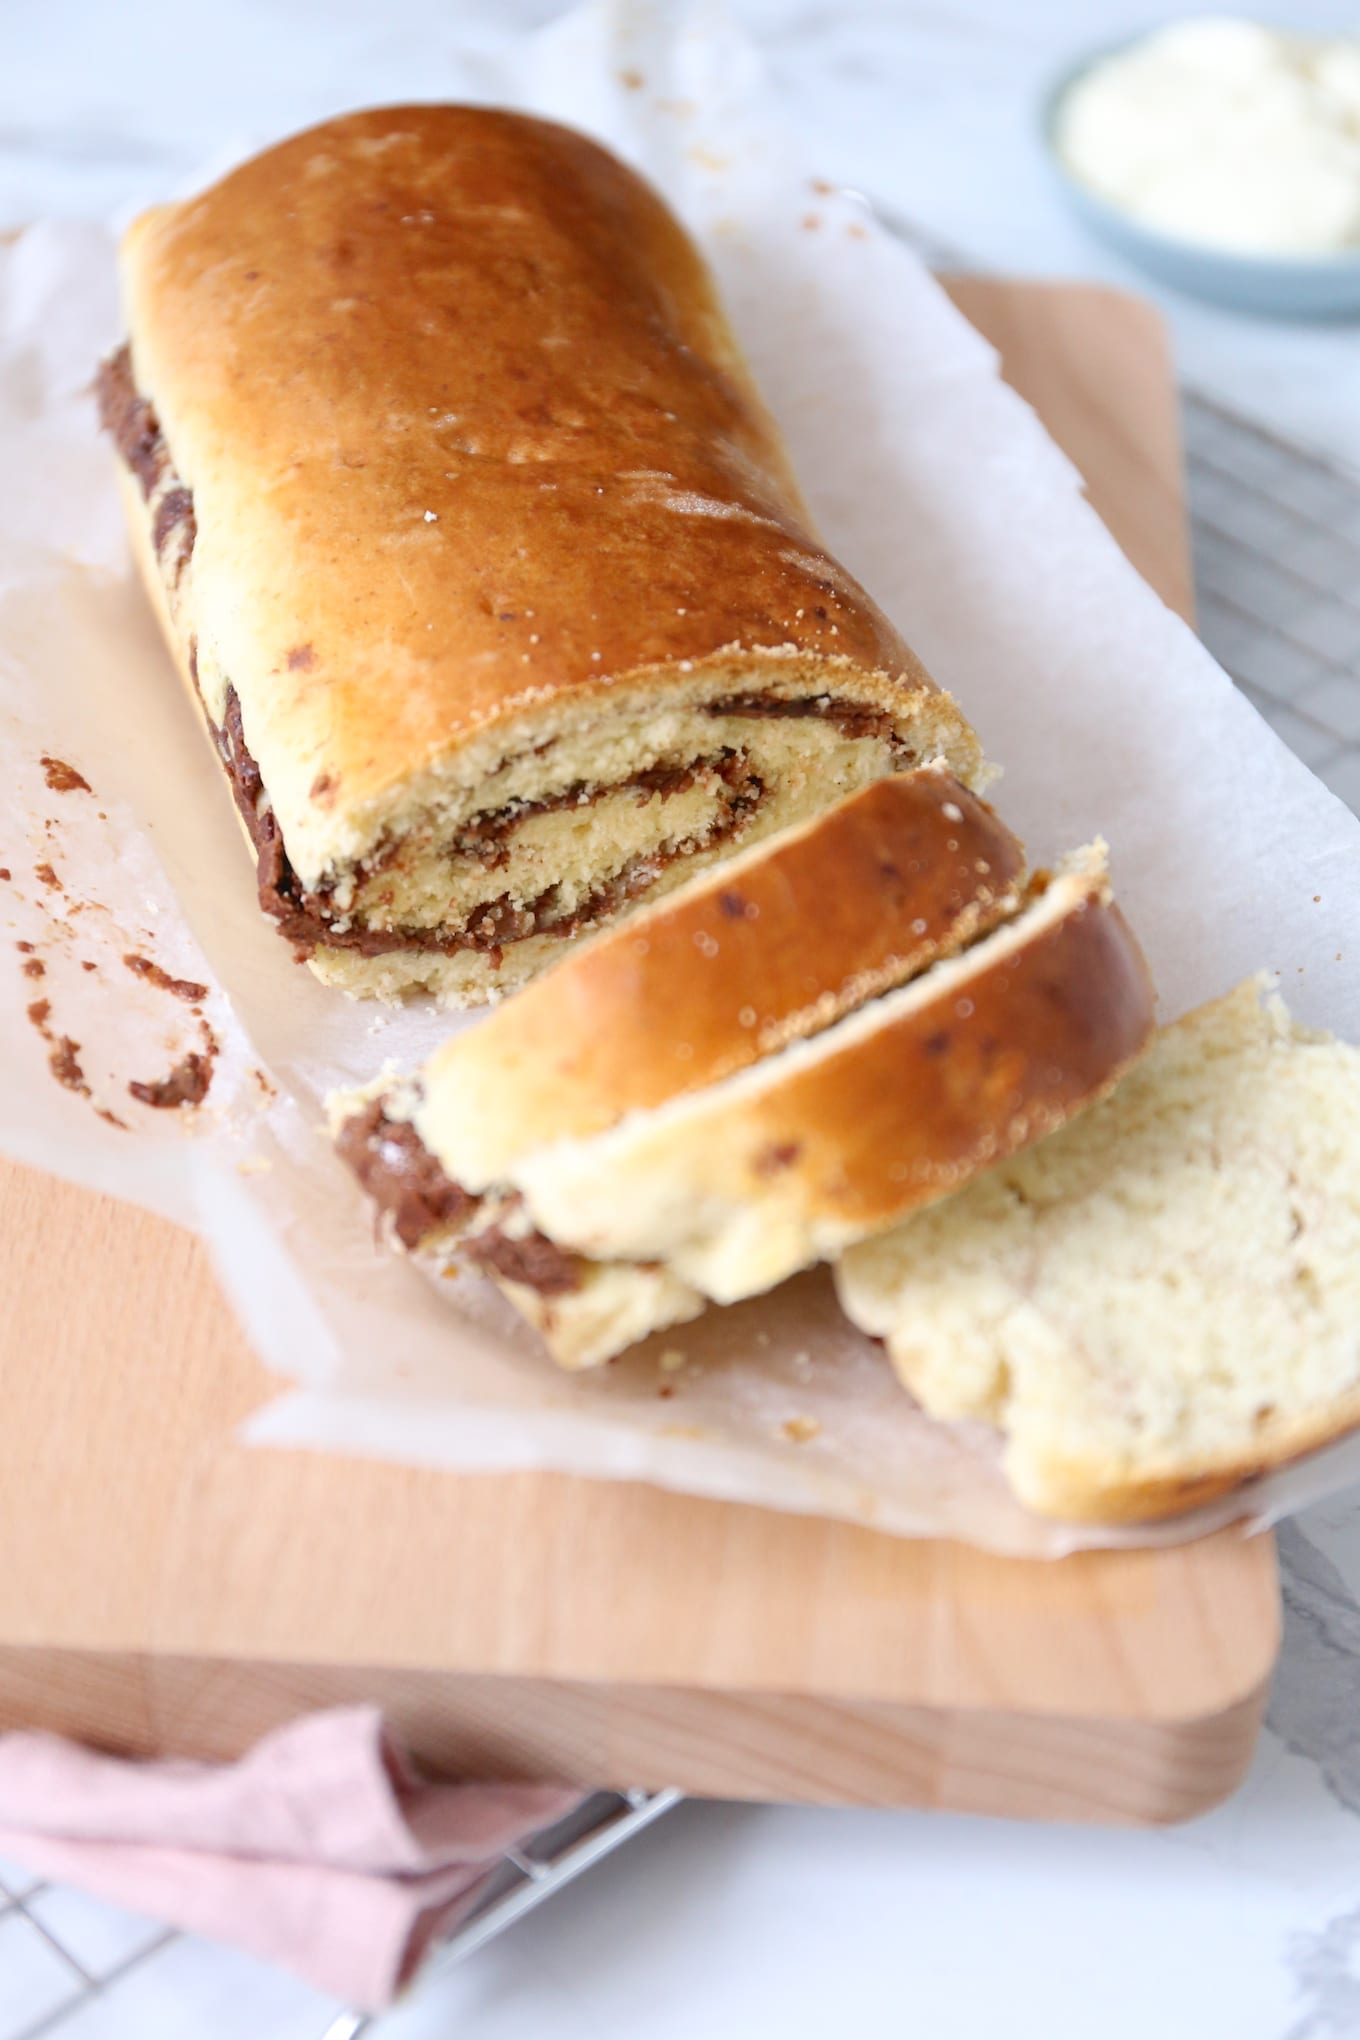 Chocolade-kaneel sconebrood